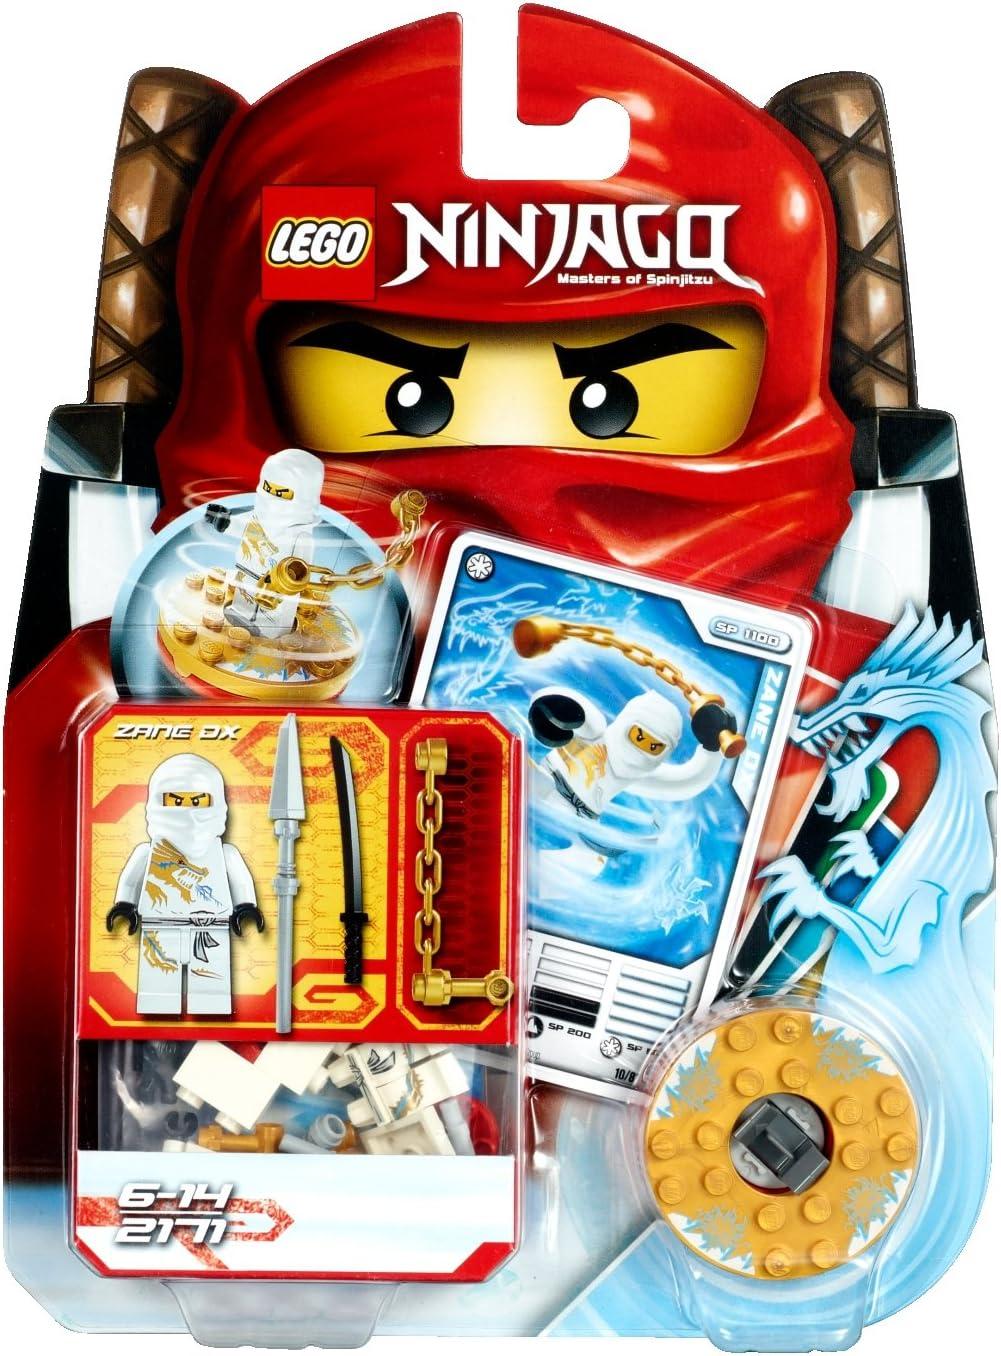 Lego Ninjago 2171 Zane DX Pack Complet-Neuf